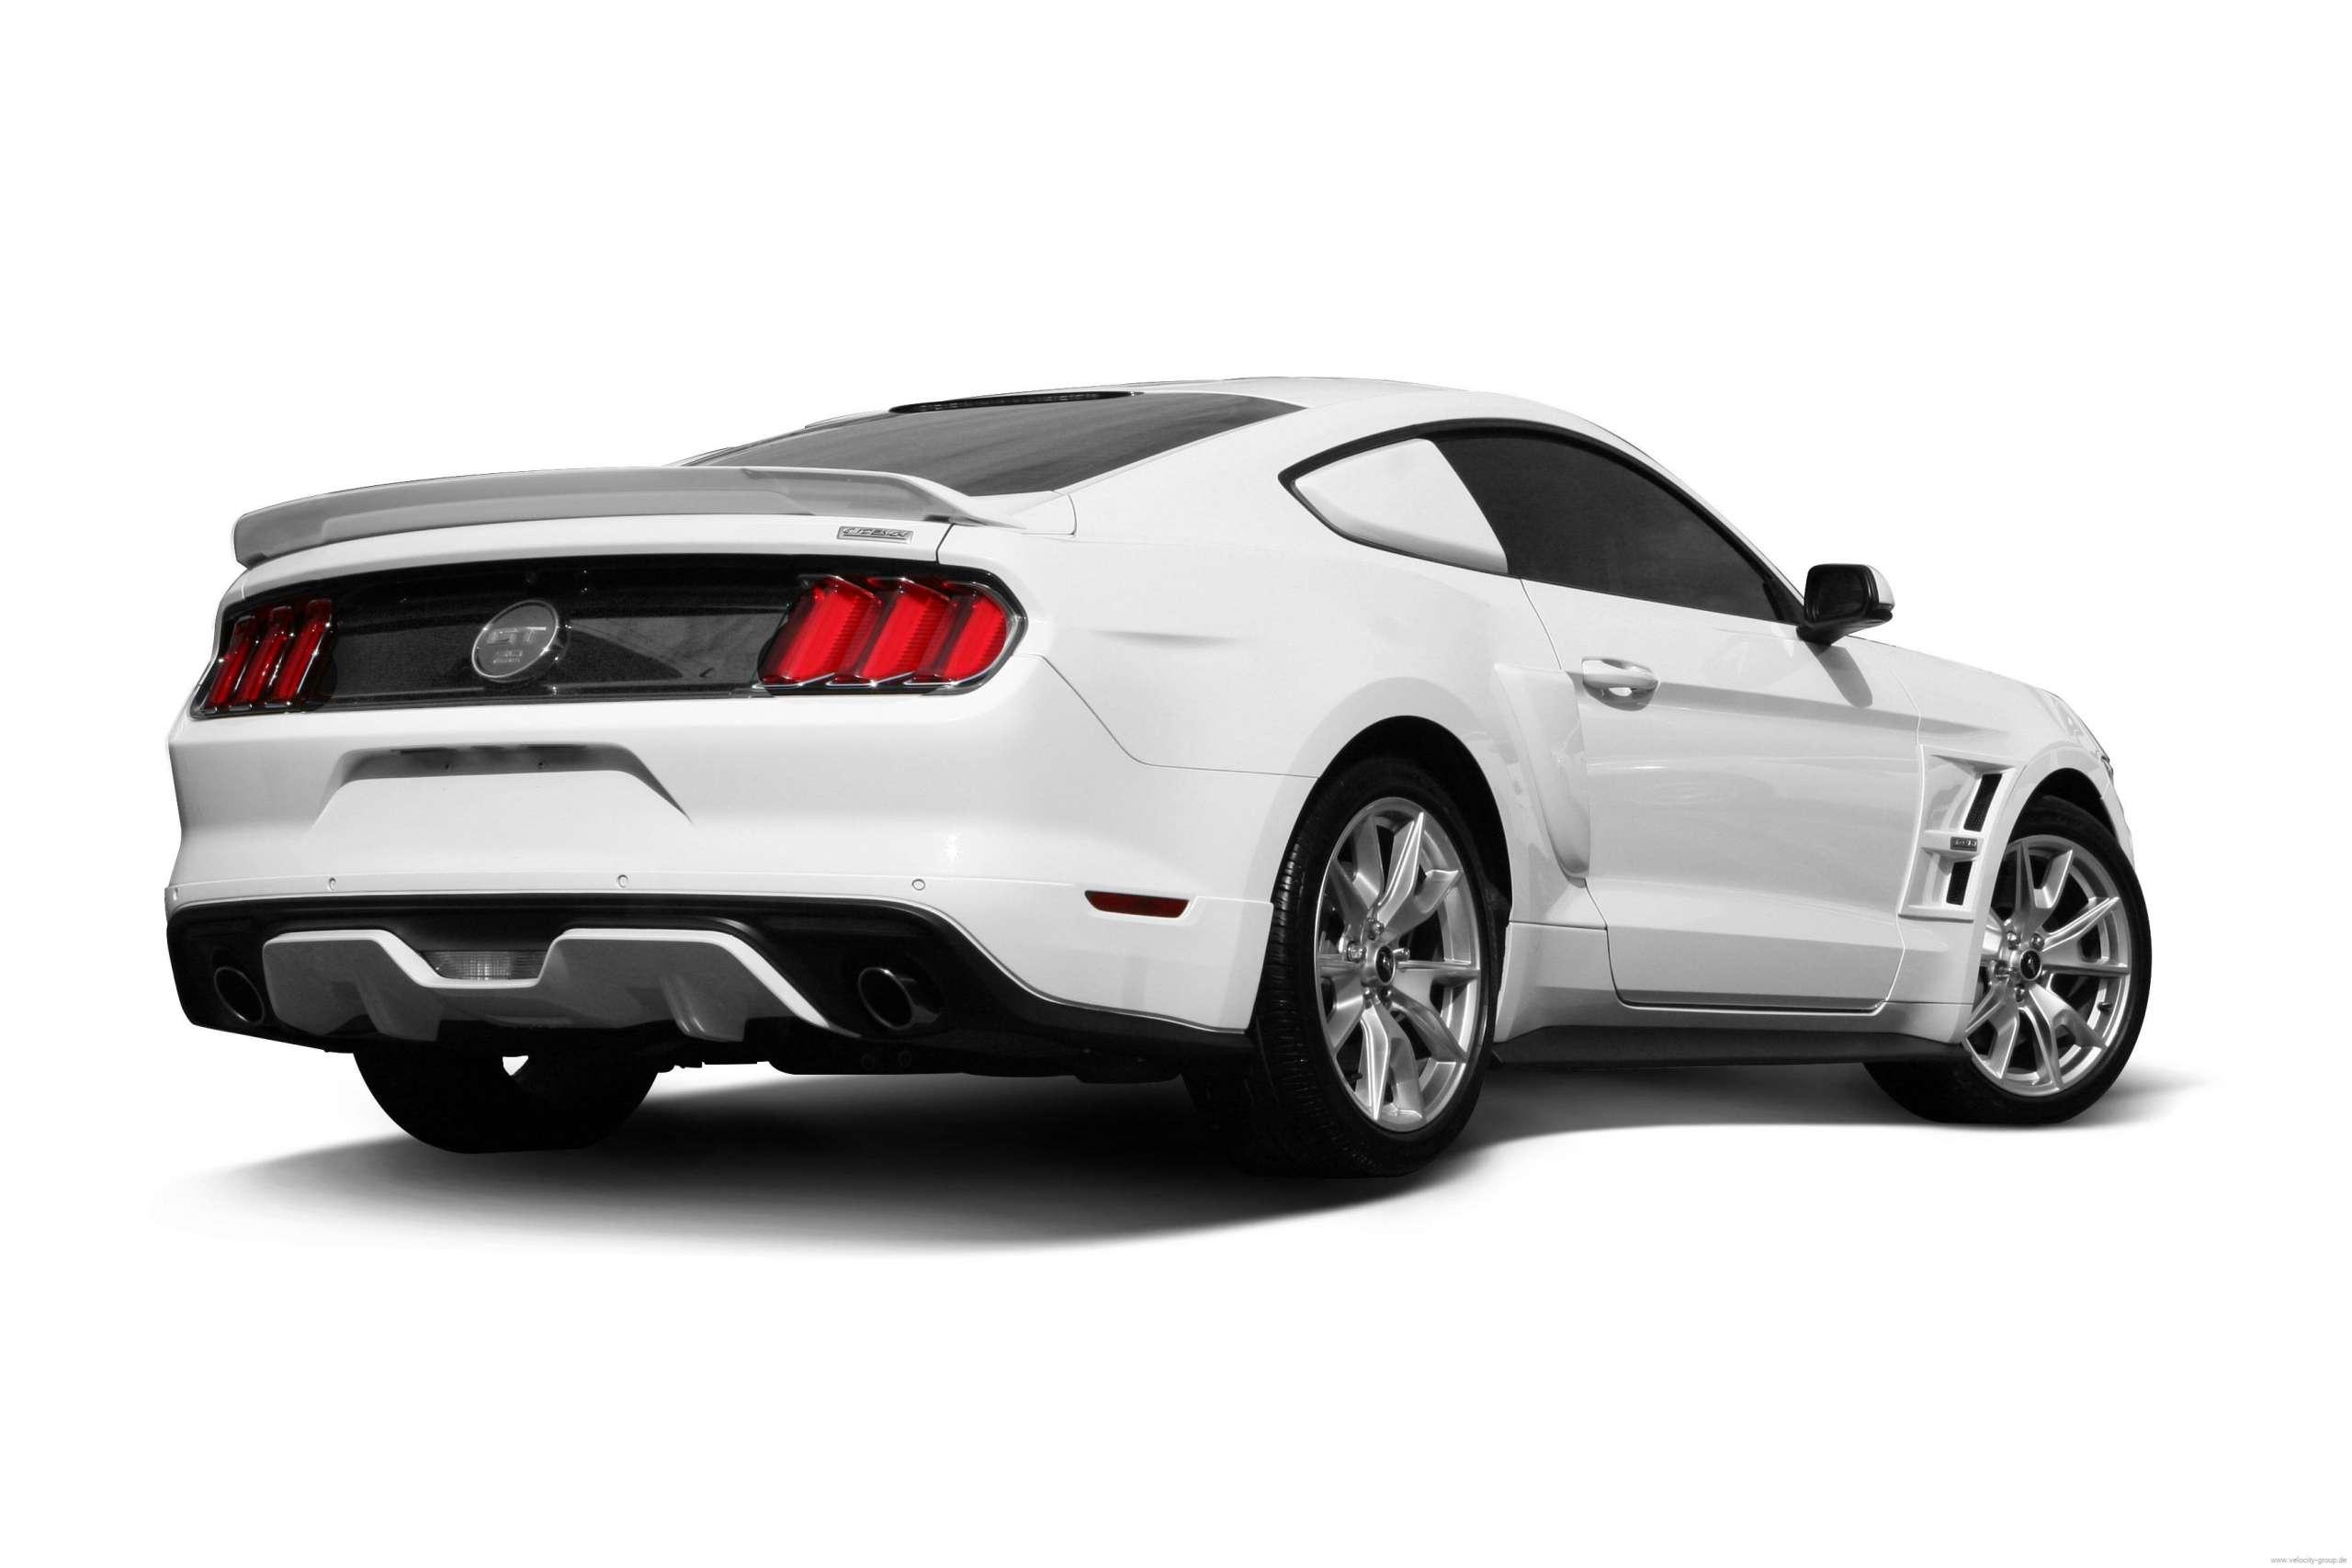 15 19 Ford Mustang Coupe Spoiler Hinten Unlackiert